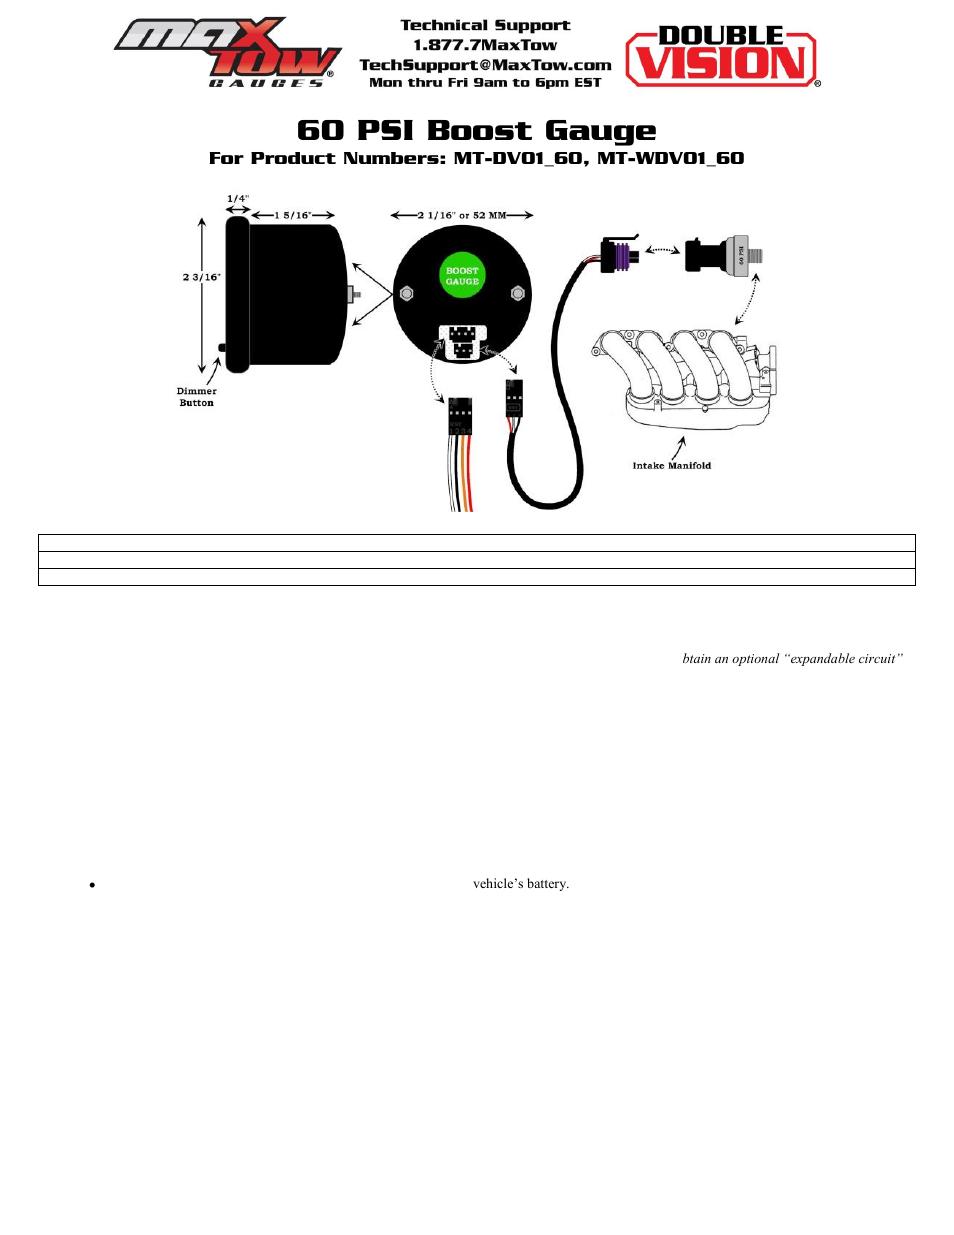 Pyrometer Wire Harness on sensor wire harness, packaging wire harness, microwave wire harness, relay wire harness, pump wire harness, probe wire harness, cone wire harness, psi wire harness, burner wire harness,